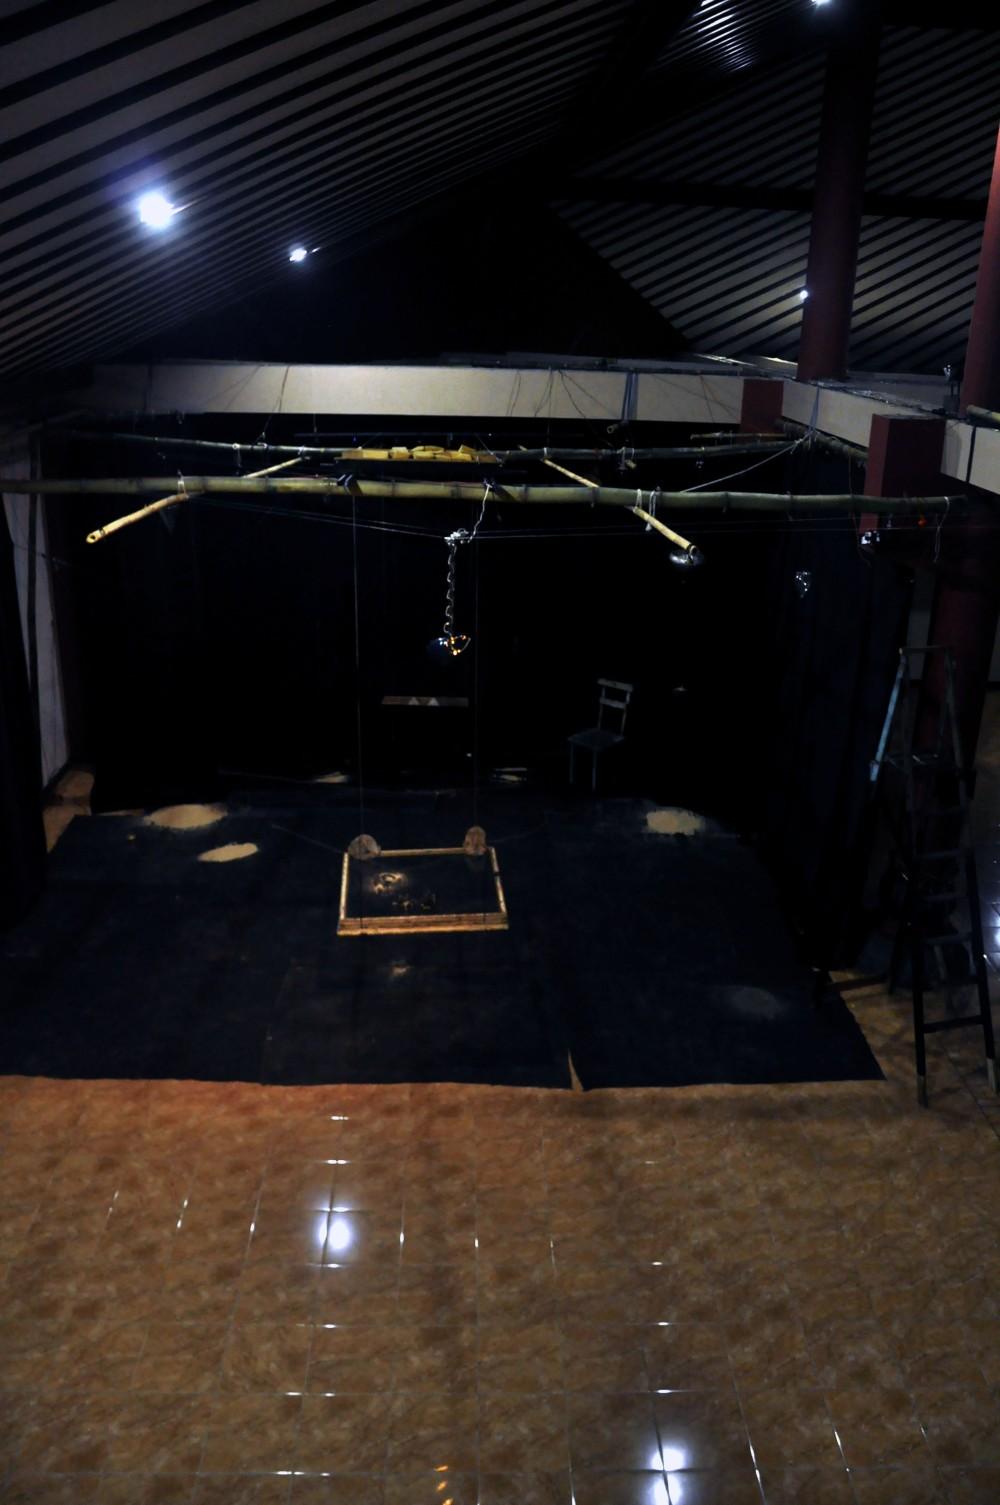 Galeri ISI Surakarta.Boite noir; Automne 2085